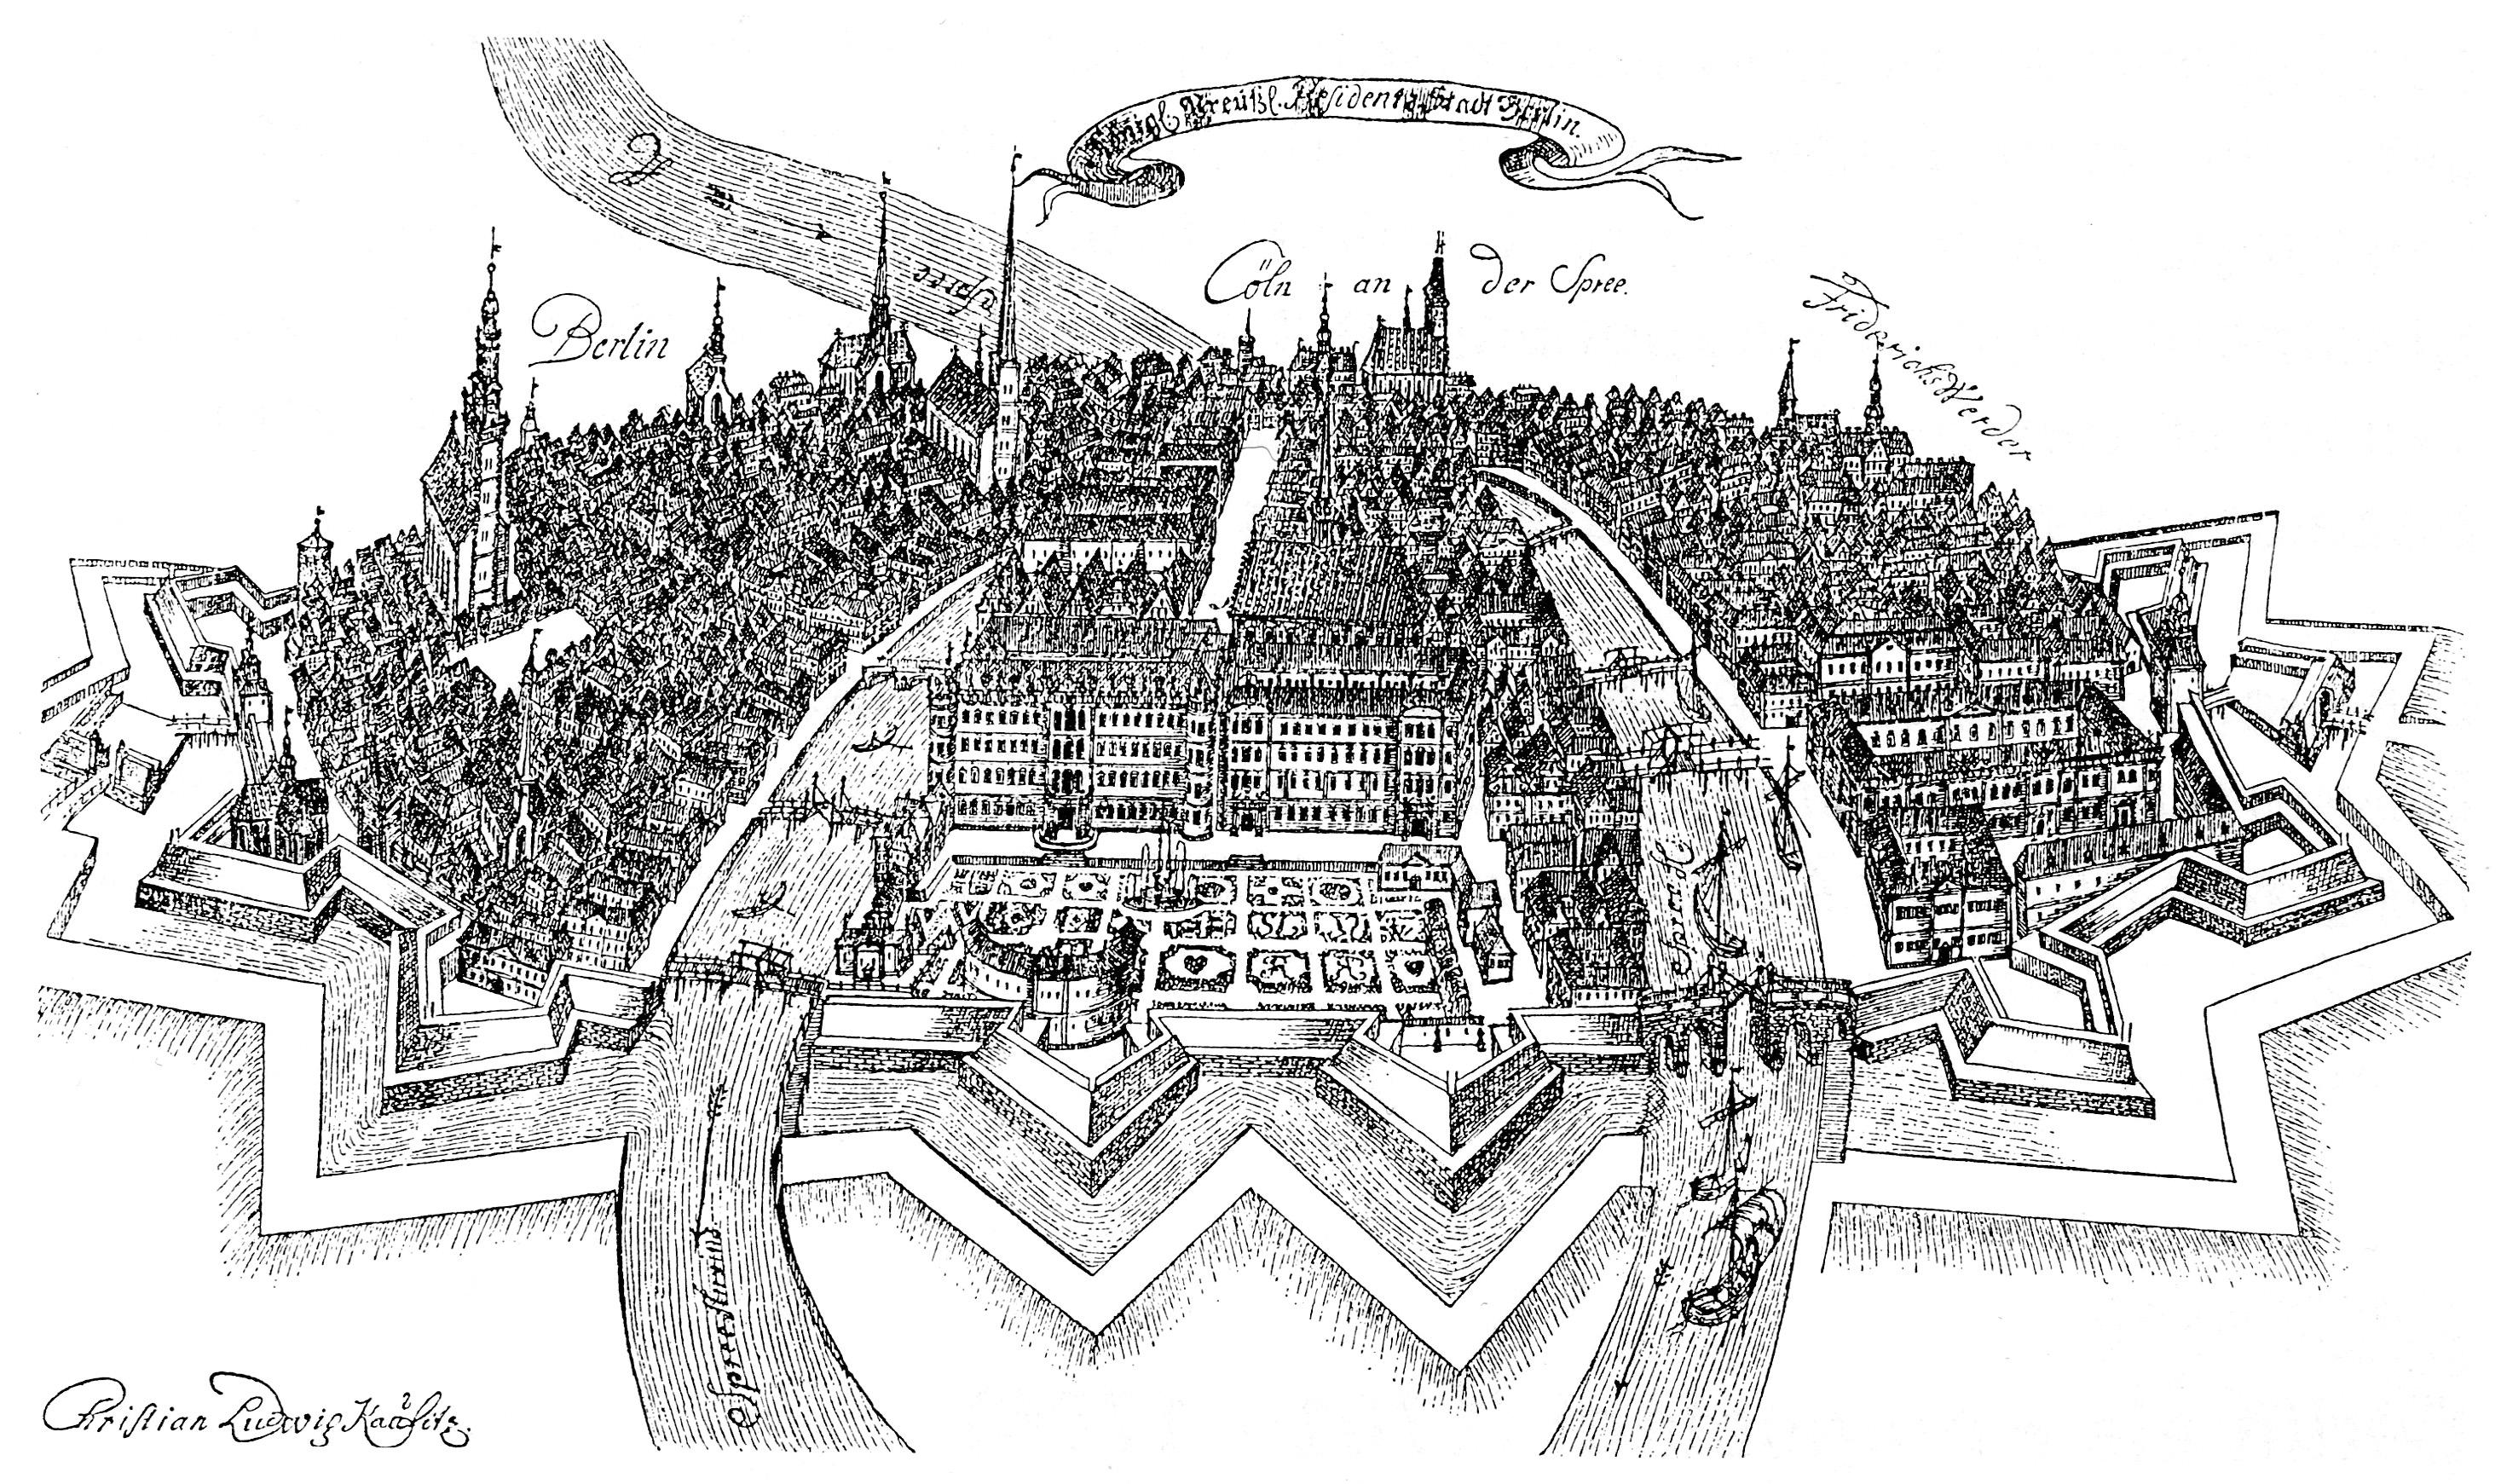 Berlin 1237